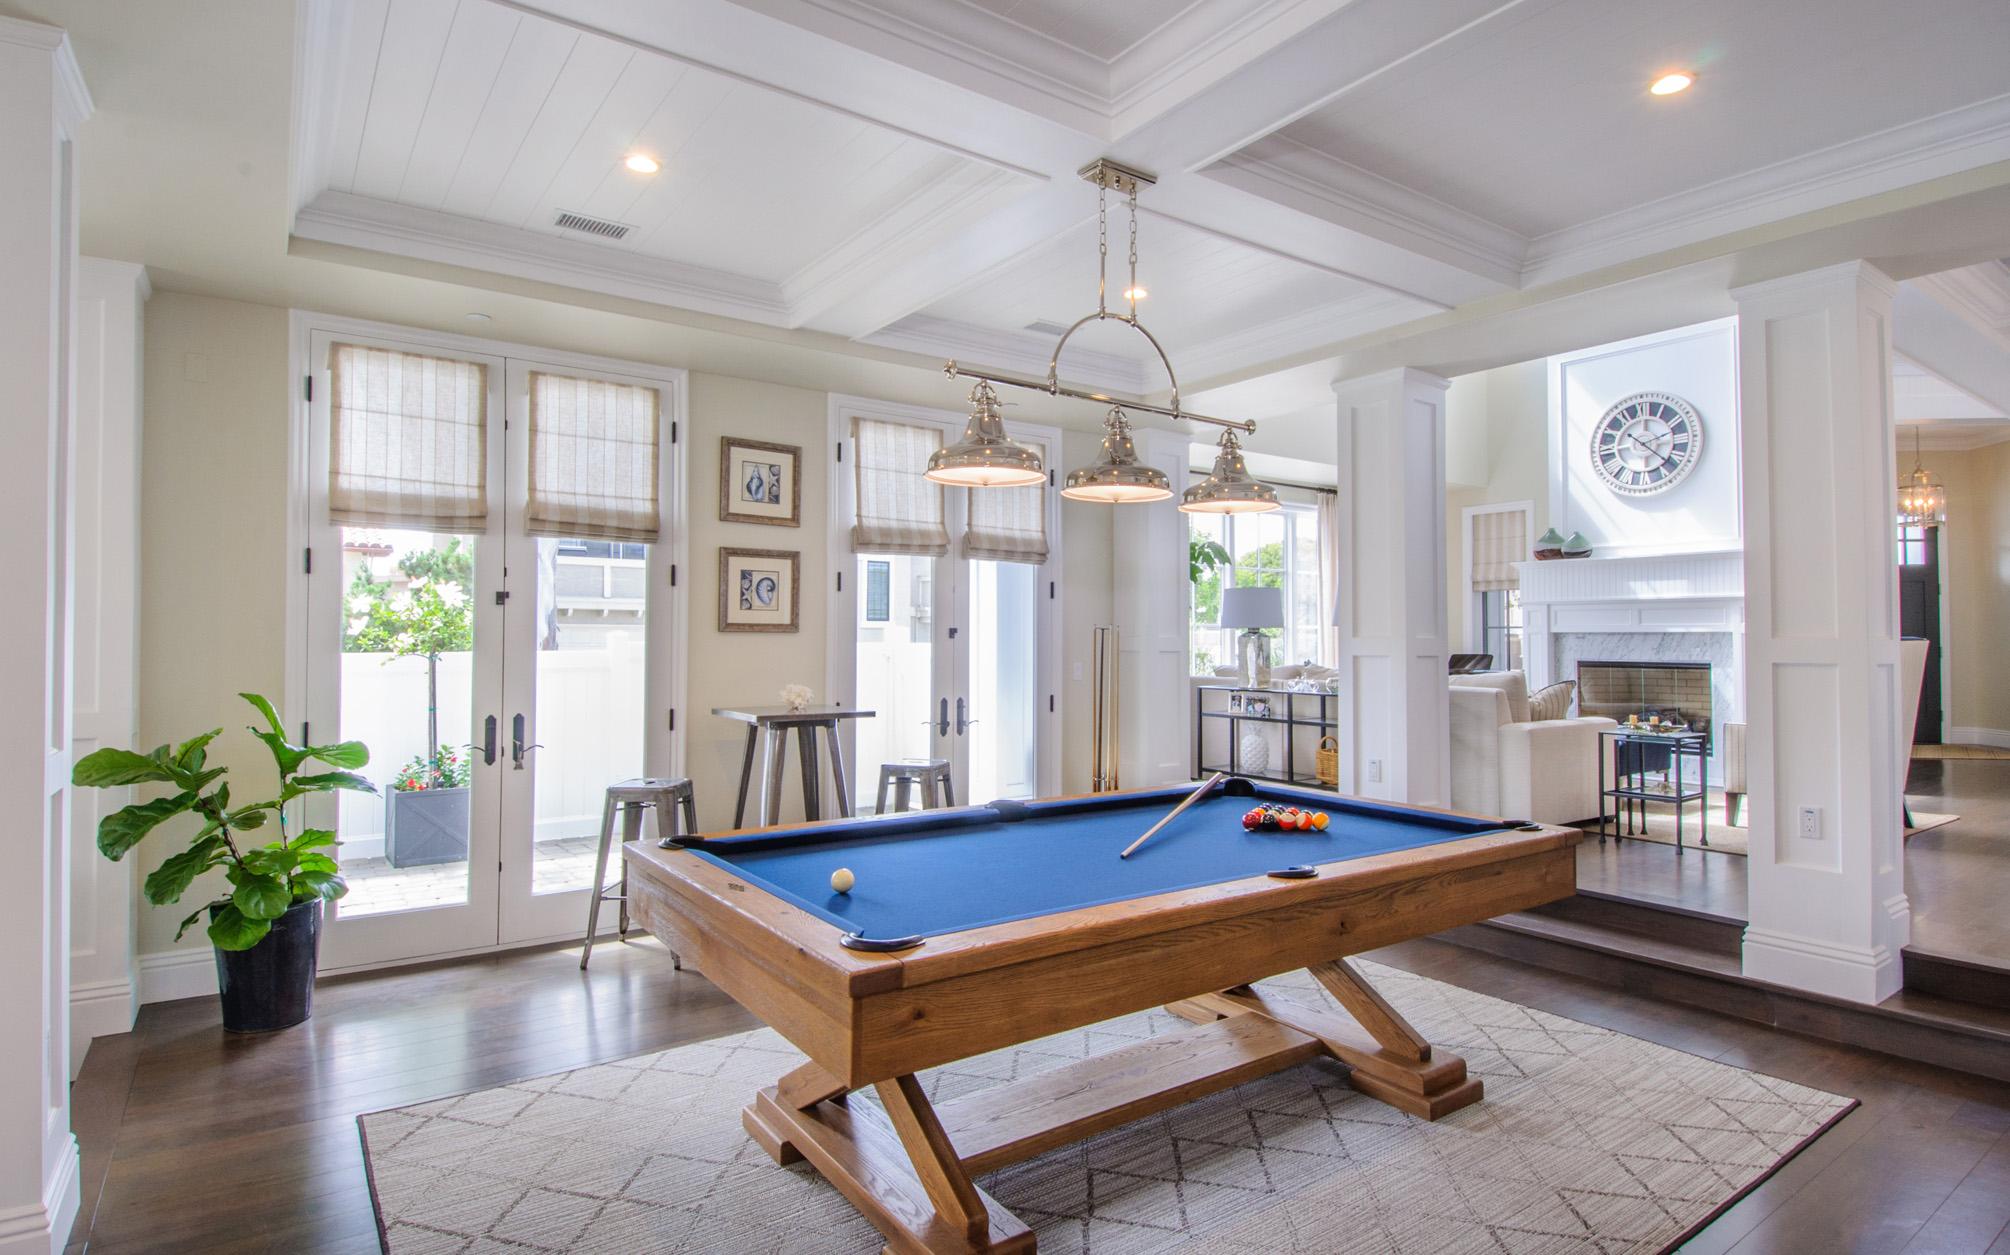 capecod - pool table - navy.jpg